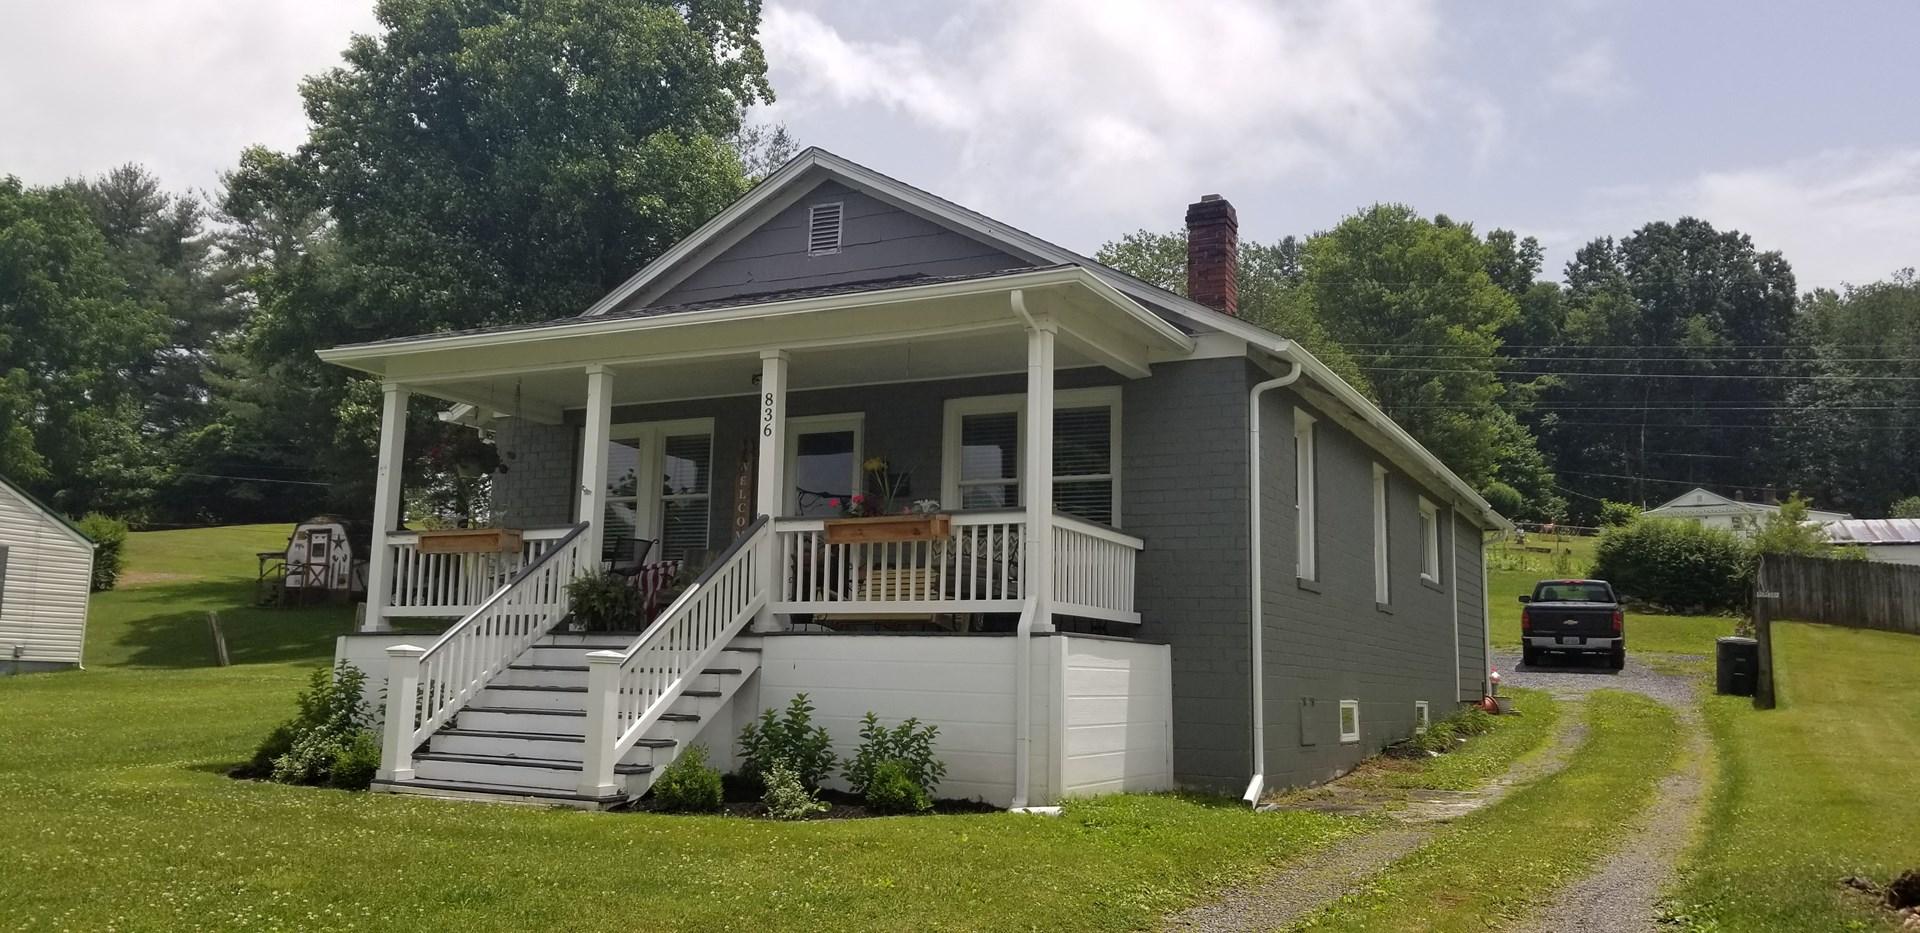 Charming Home in Historical Abingdon, VA!